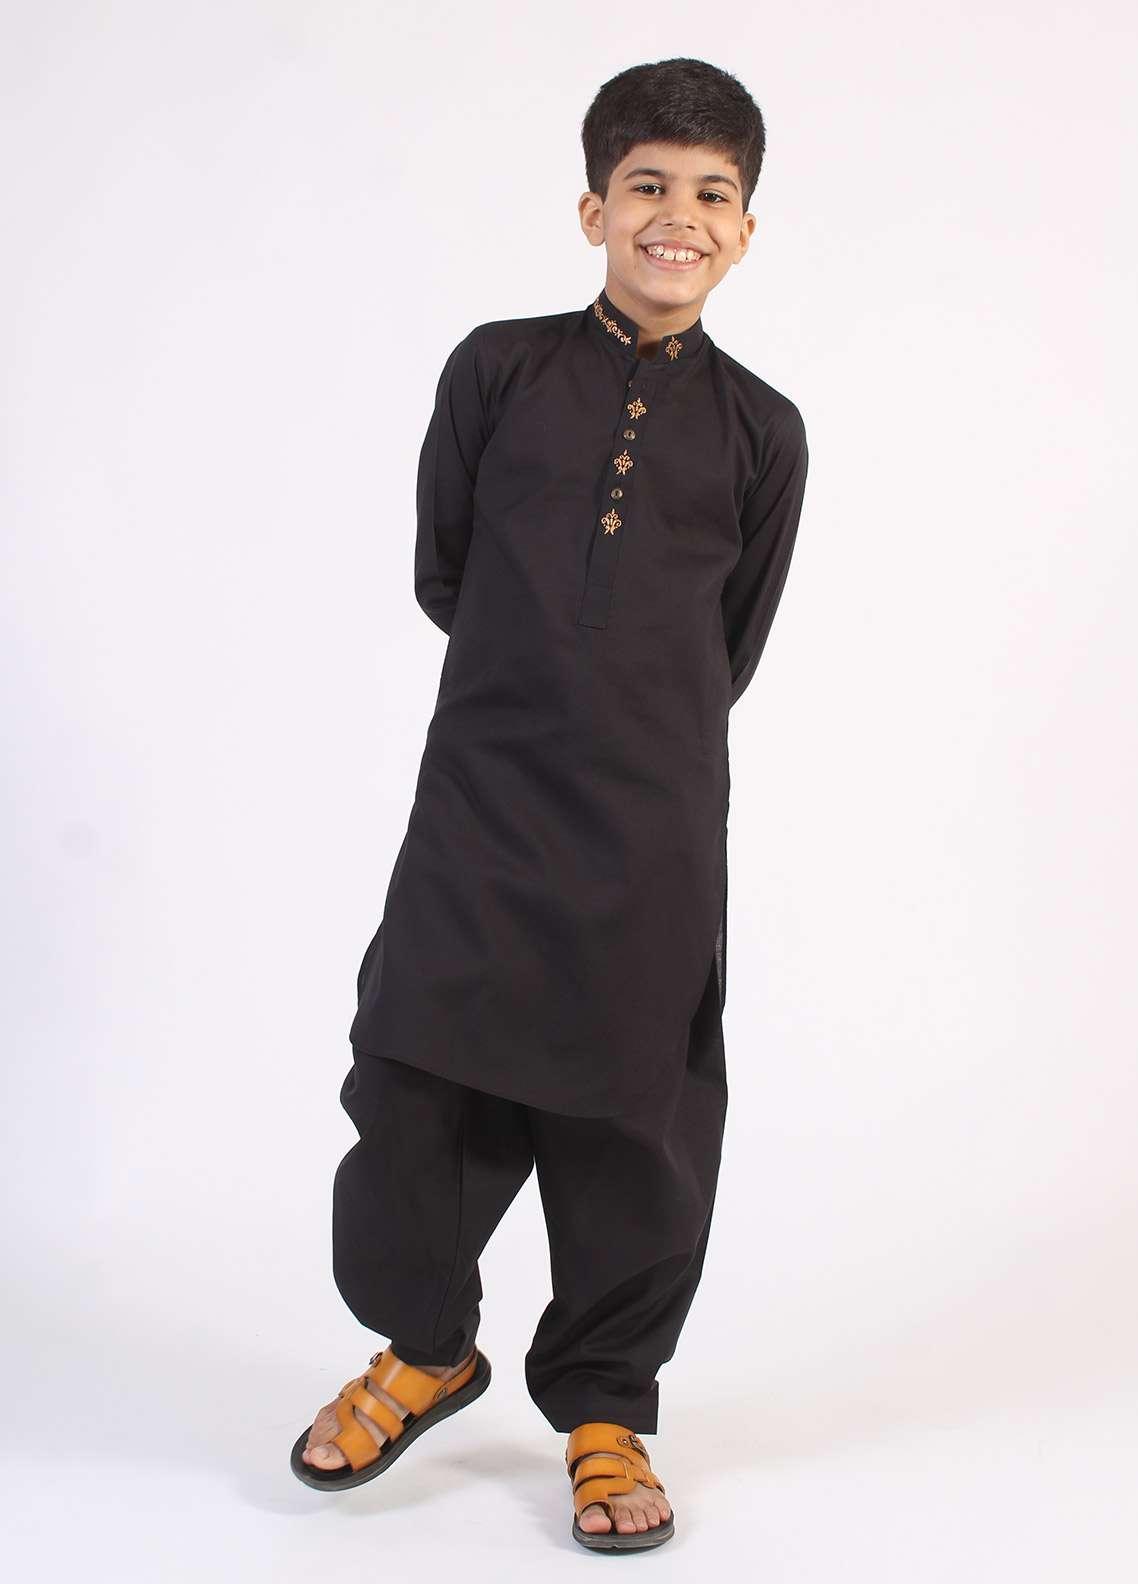 Aizaz Zafar Cotton Embroidered Kameez Shalwar for Boys - Black AZ18B 200